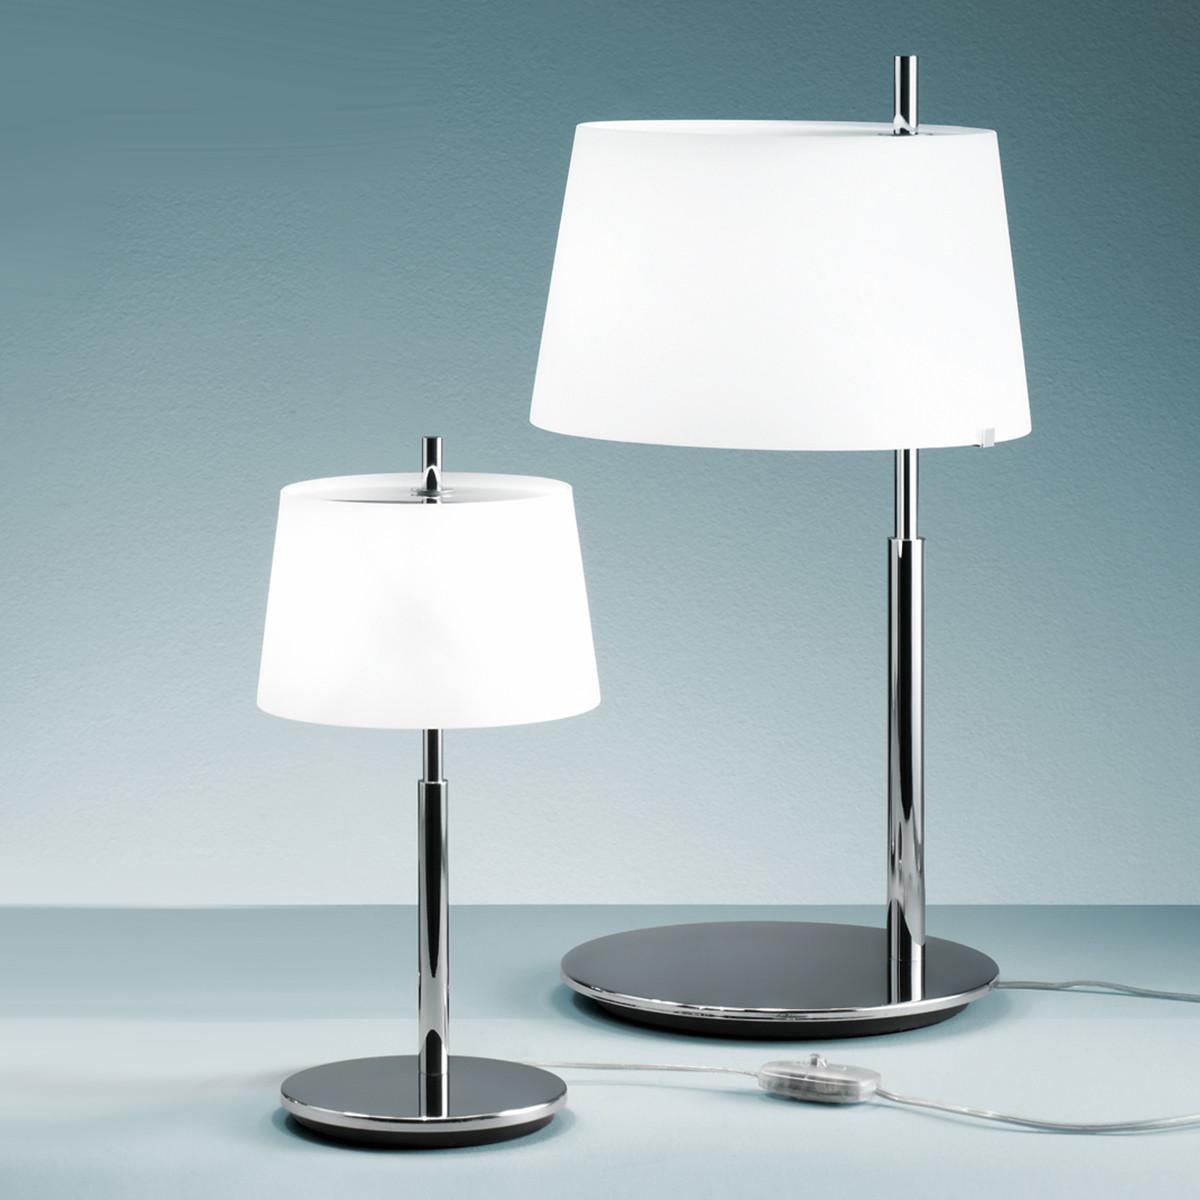 fontana arte passion tischleuchte casa de. Black Bedroom Furniture Sets. Home Design Ideas